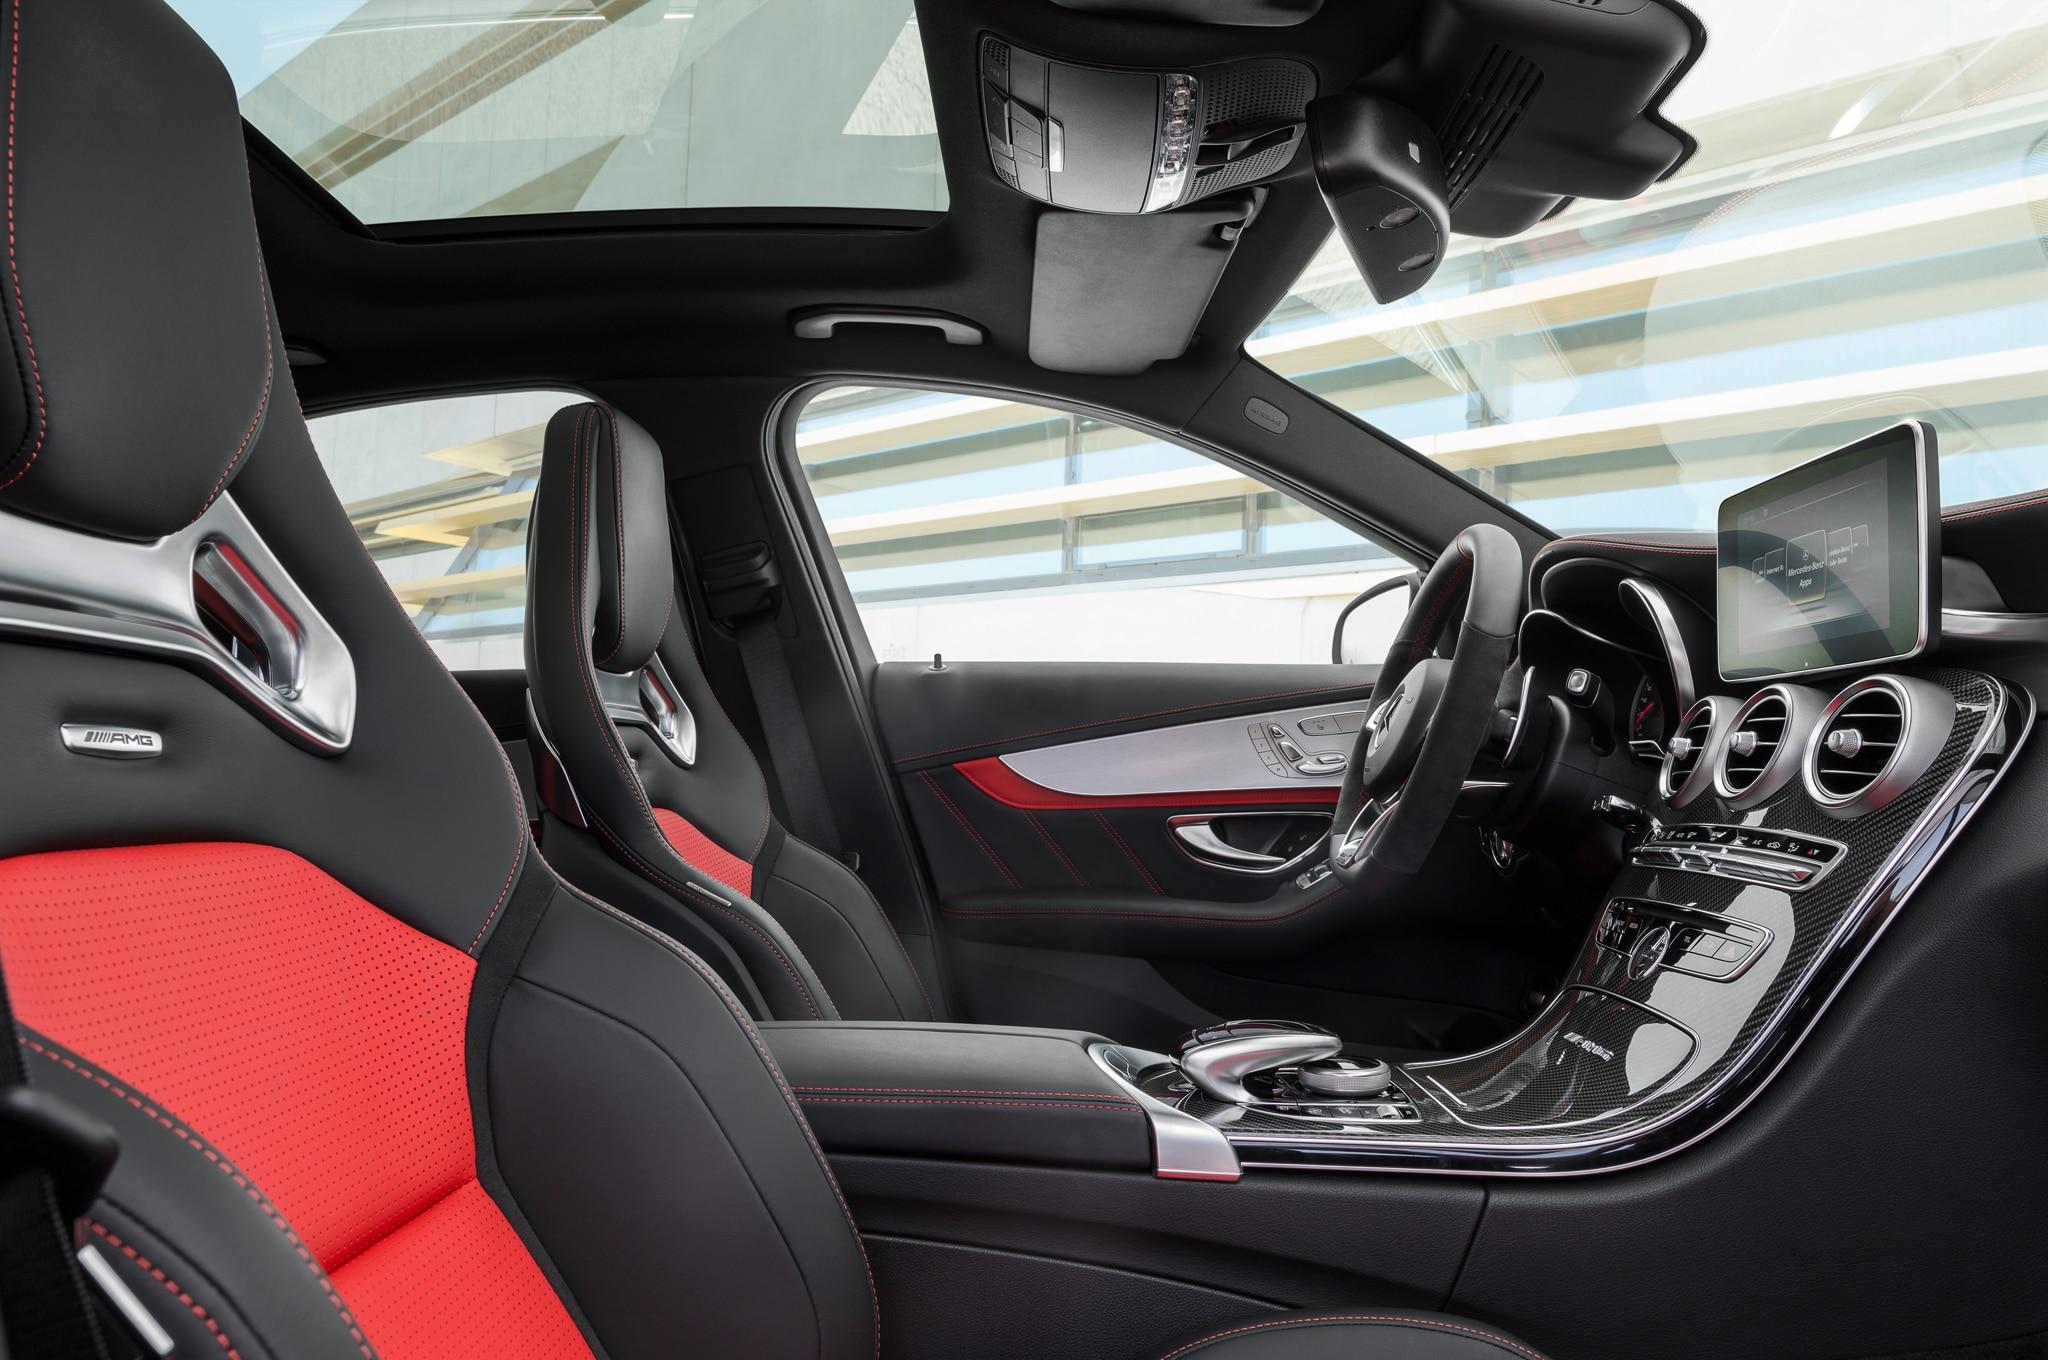 Benz cla class cla 250 edition 1 interior 1920x1080 59 of 183 - 2015 Mercedes Amg C63 S 41 250